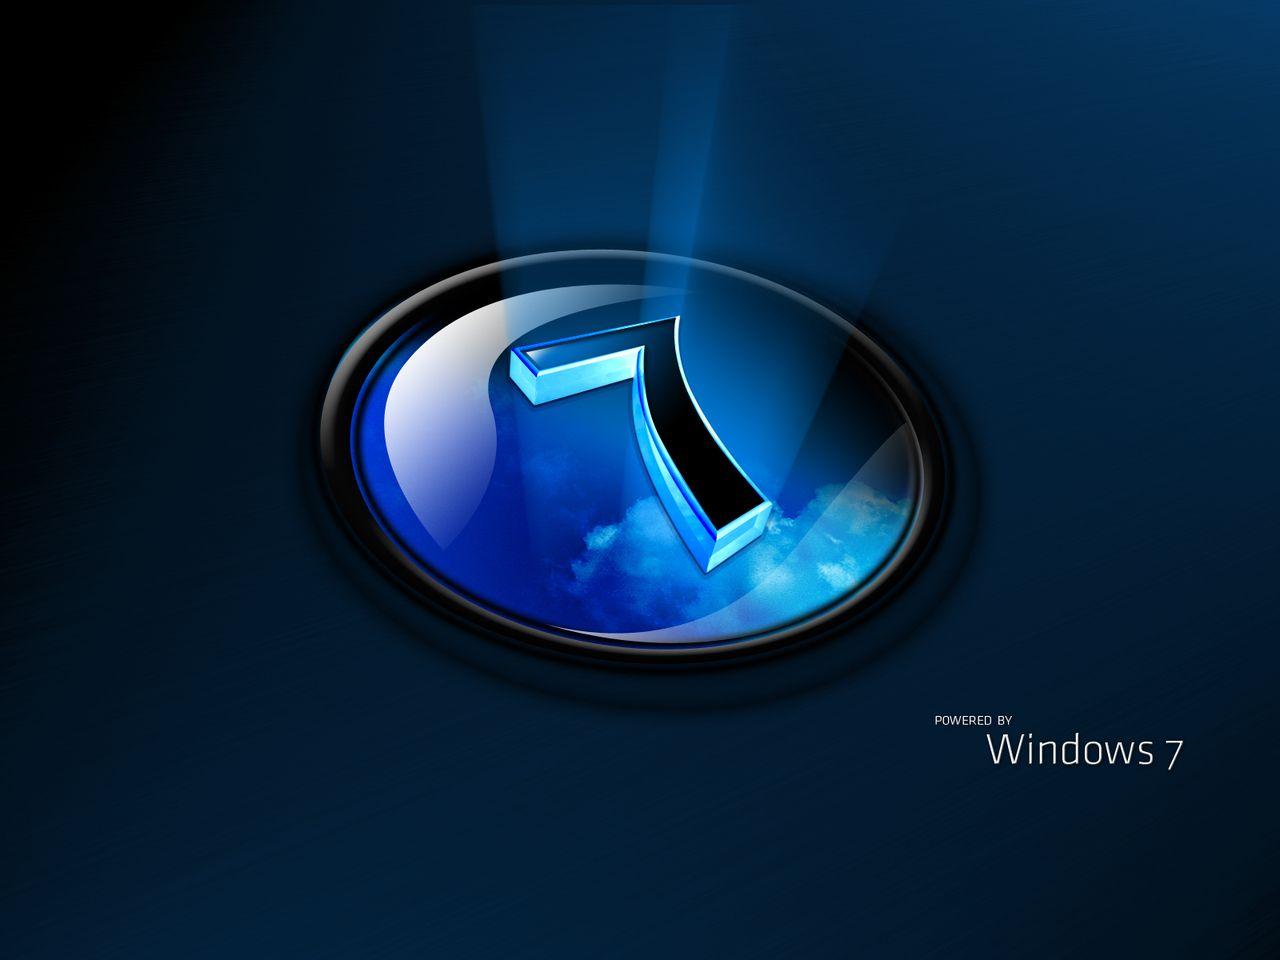 Hd Backgrounds For Windows Most Beautiful Pics Windows Hd